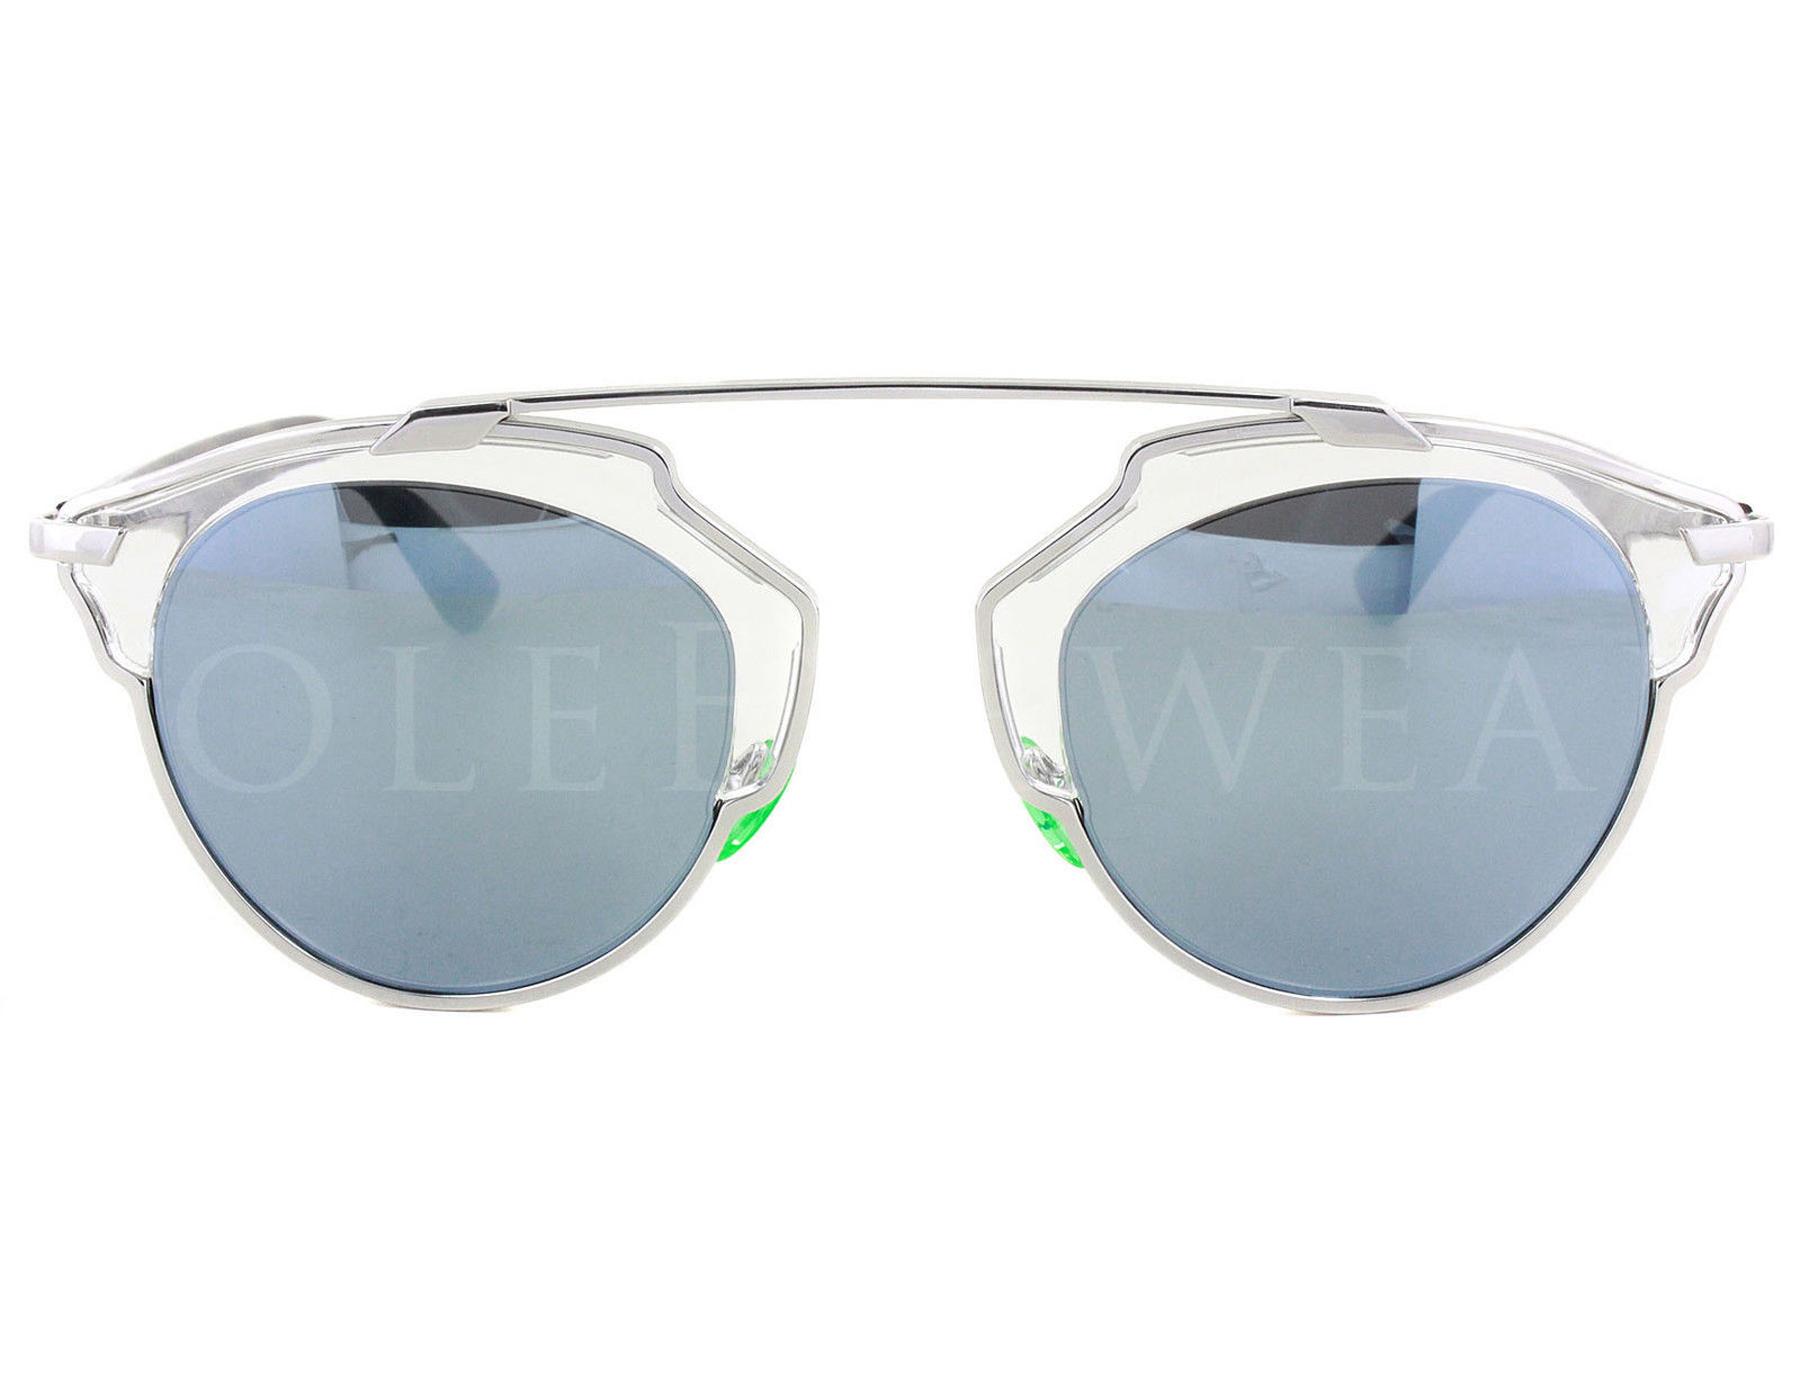 421d61ffe0b7 NEW Christian Dior So Real NSYT7 Palladium Havana   Turquoise Mirror ...